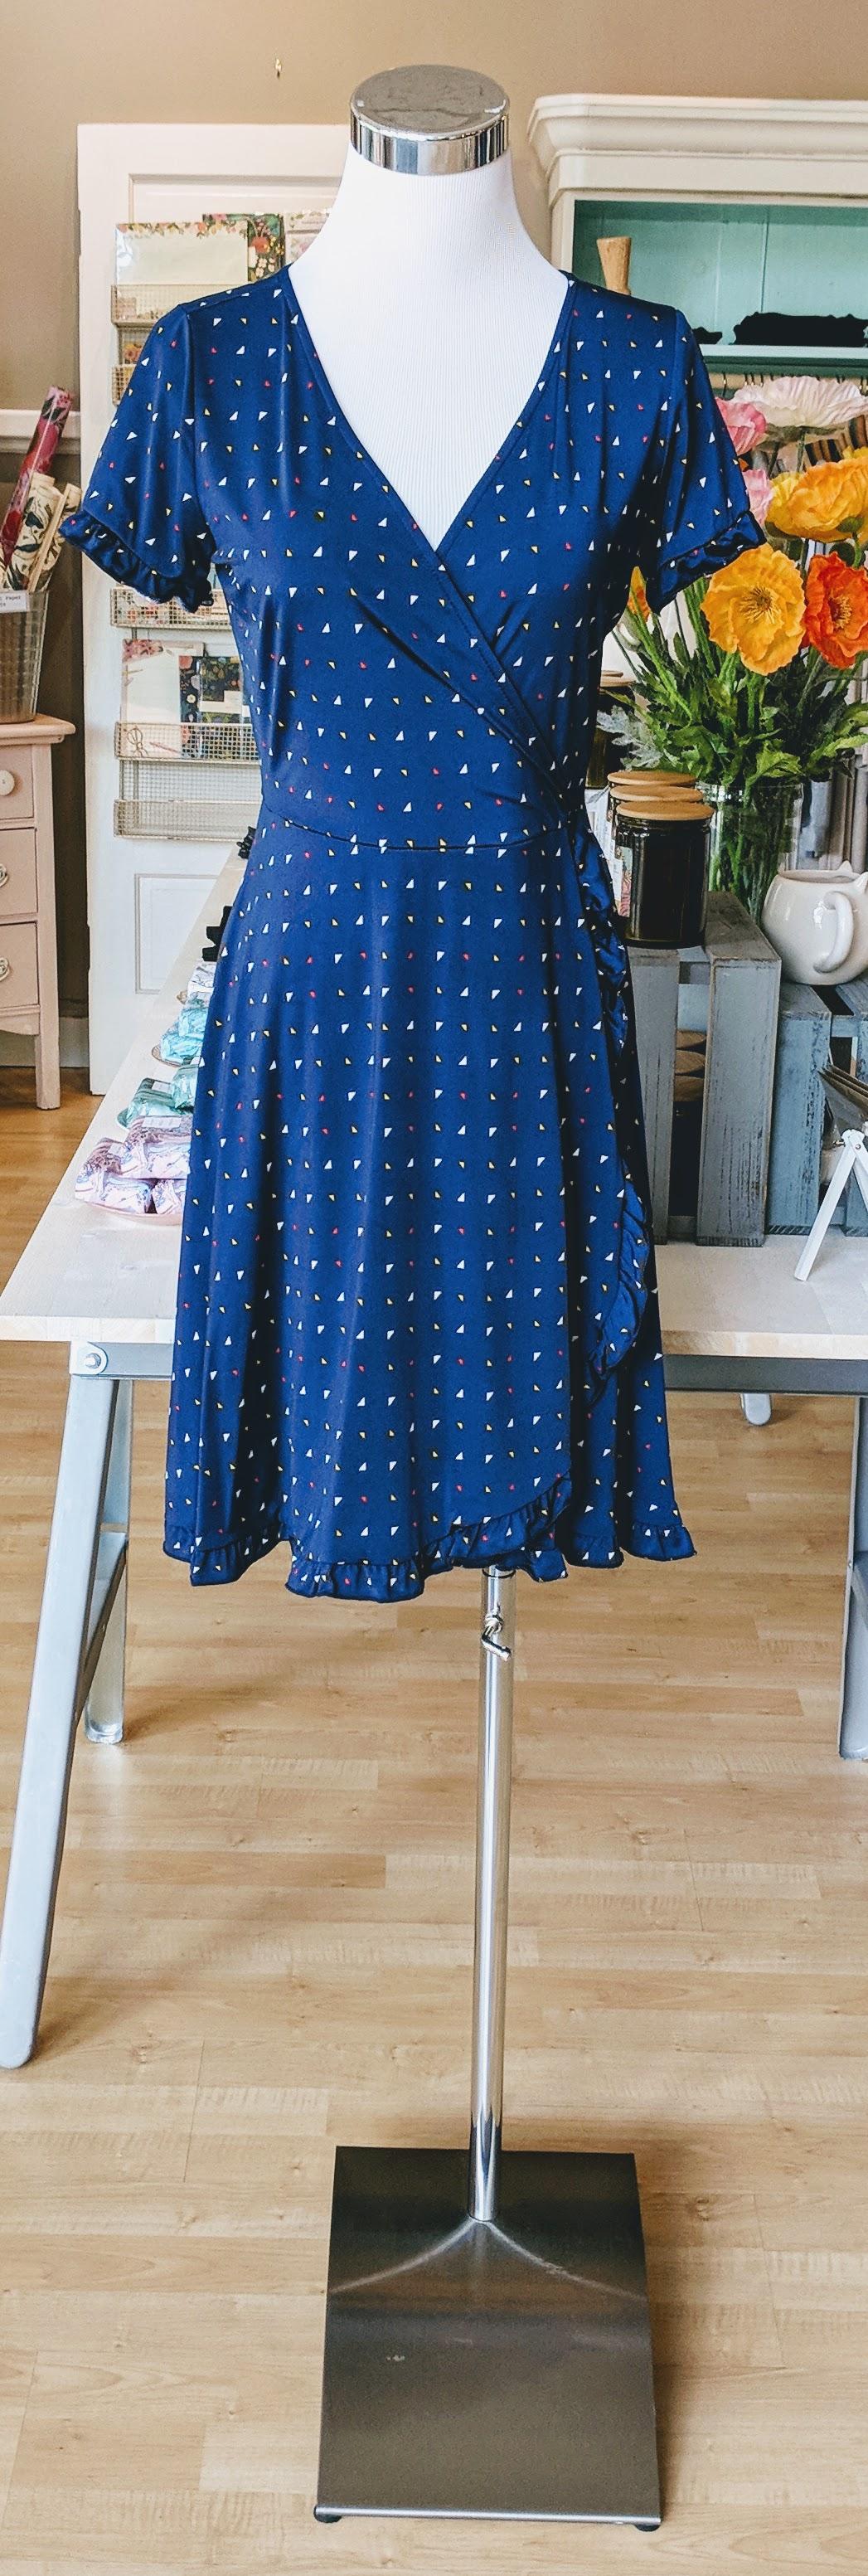 Navy triangle pattern wrap mini dress with ruffle hem.